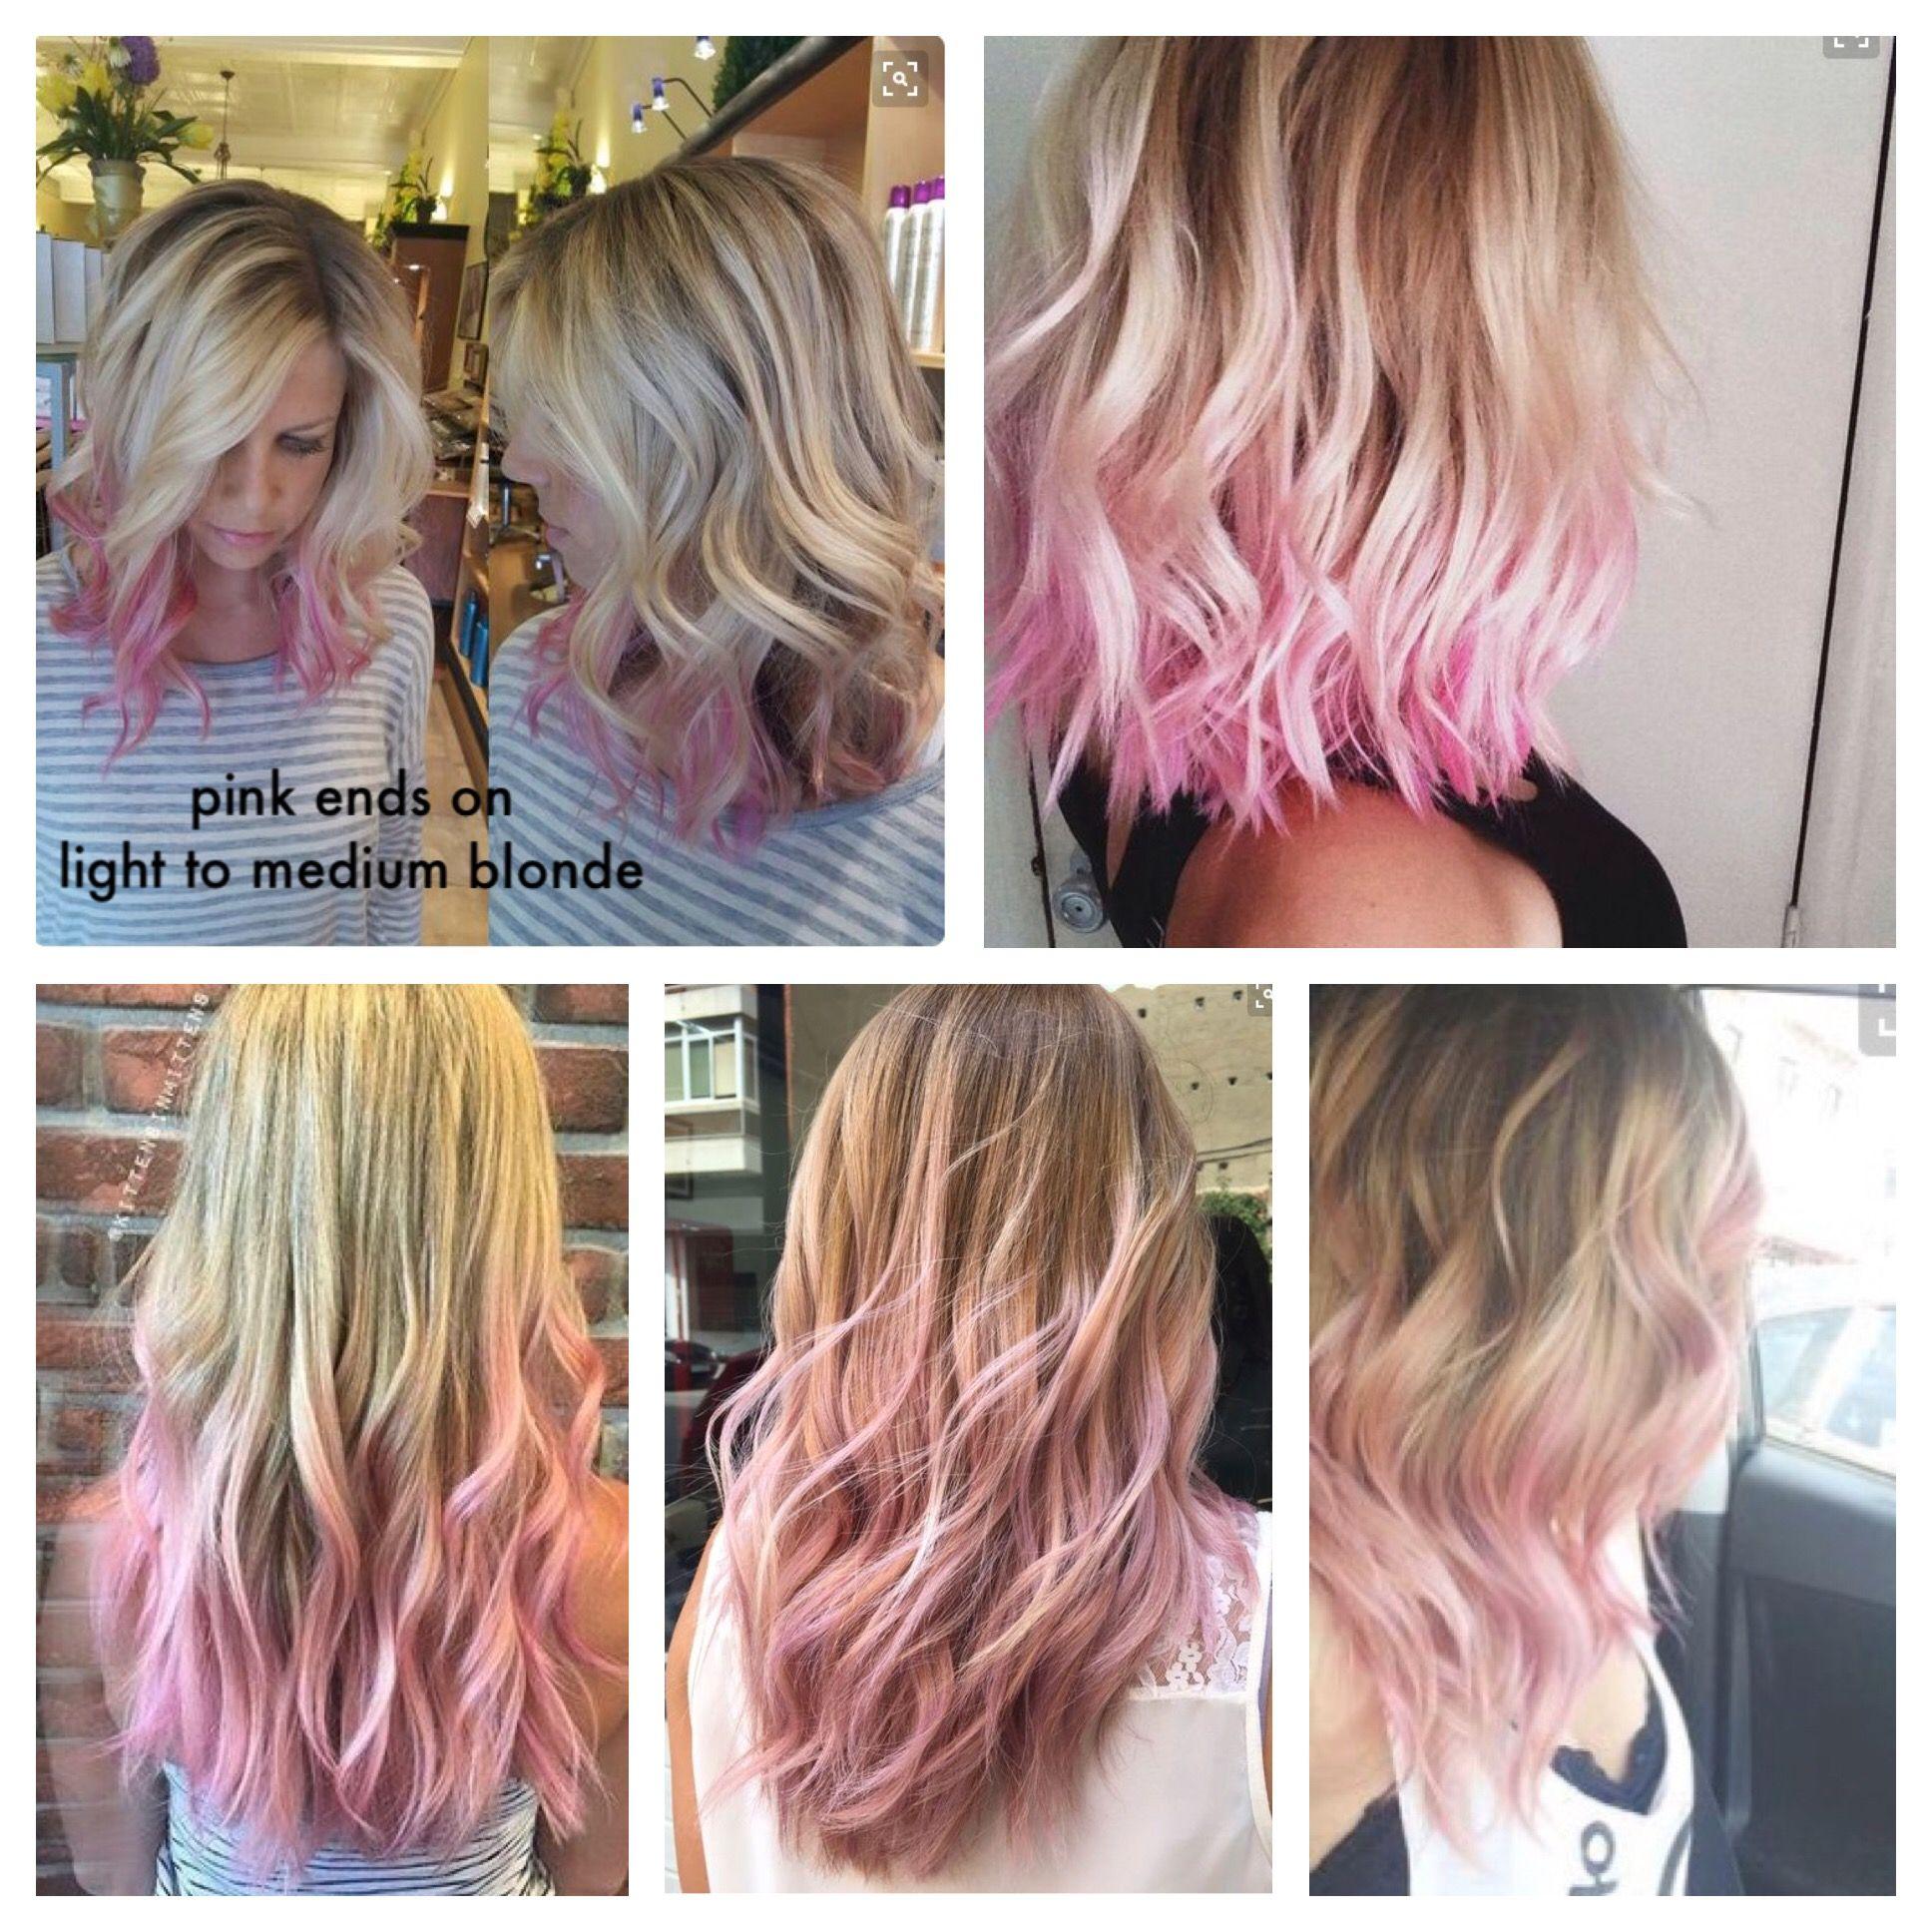 dip dye fade in color bleed pink ends on blonde